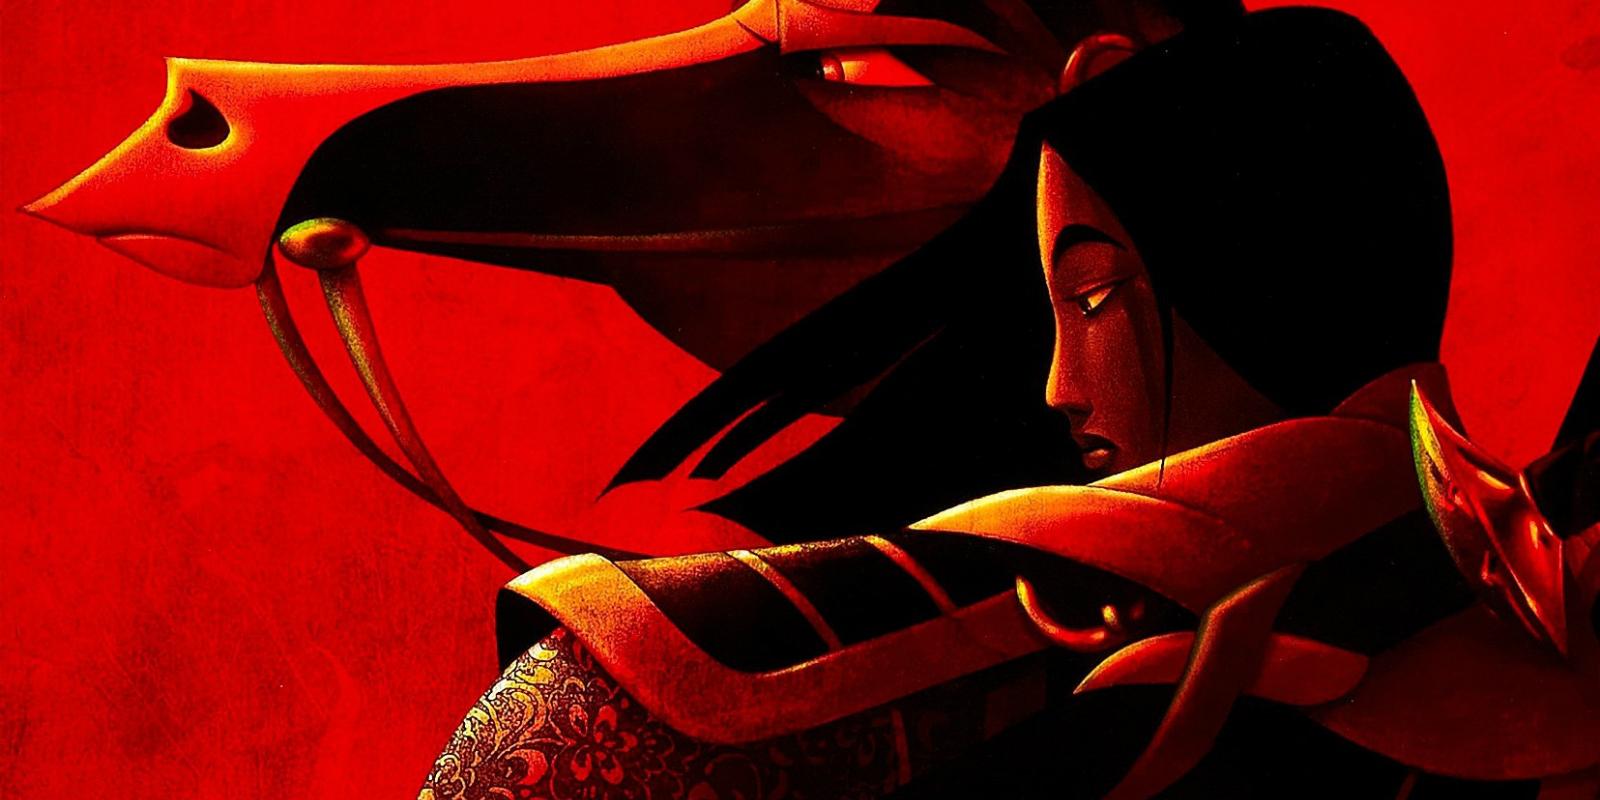 Disney's live-action Mulan set for 2018 release